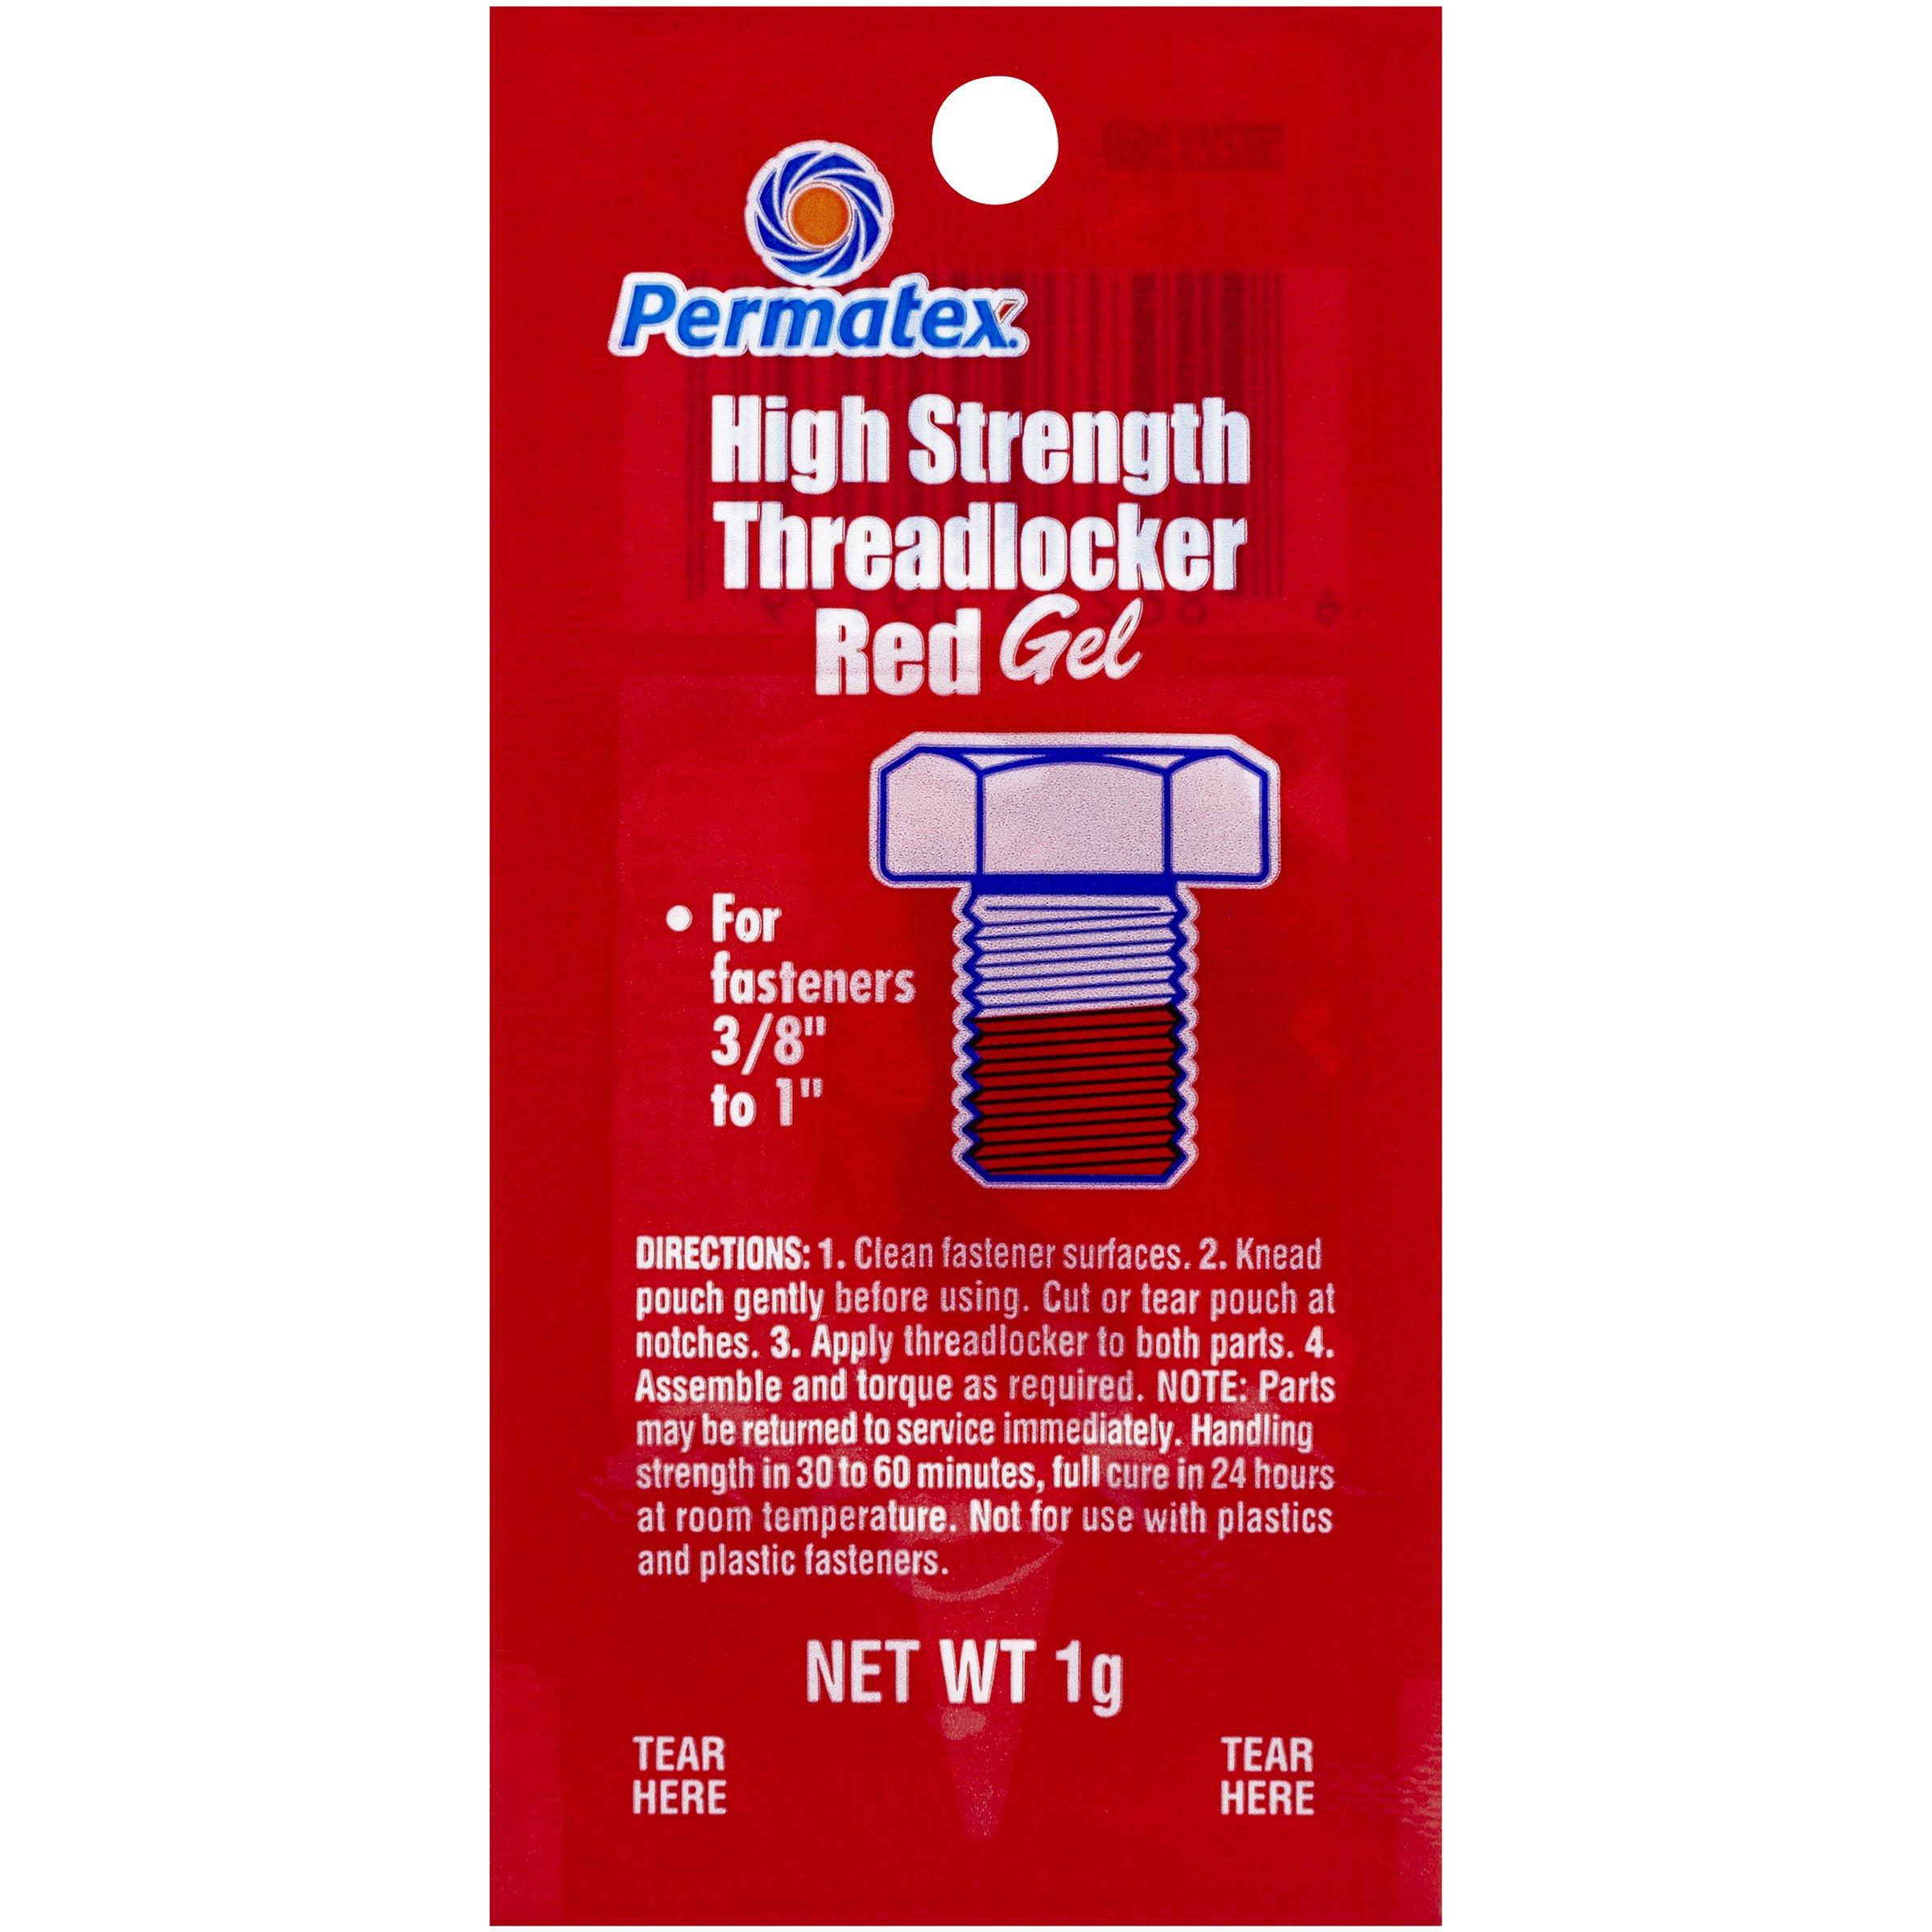 Permatex 09979-480pk Counterman's Choice Threadlocker Red (Pack of 480) by Permatex